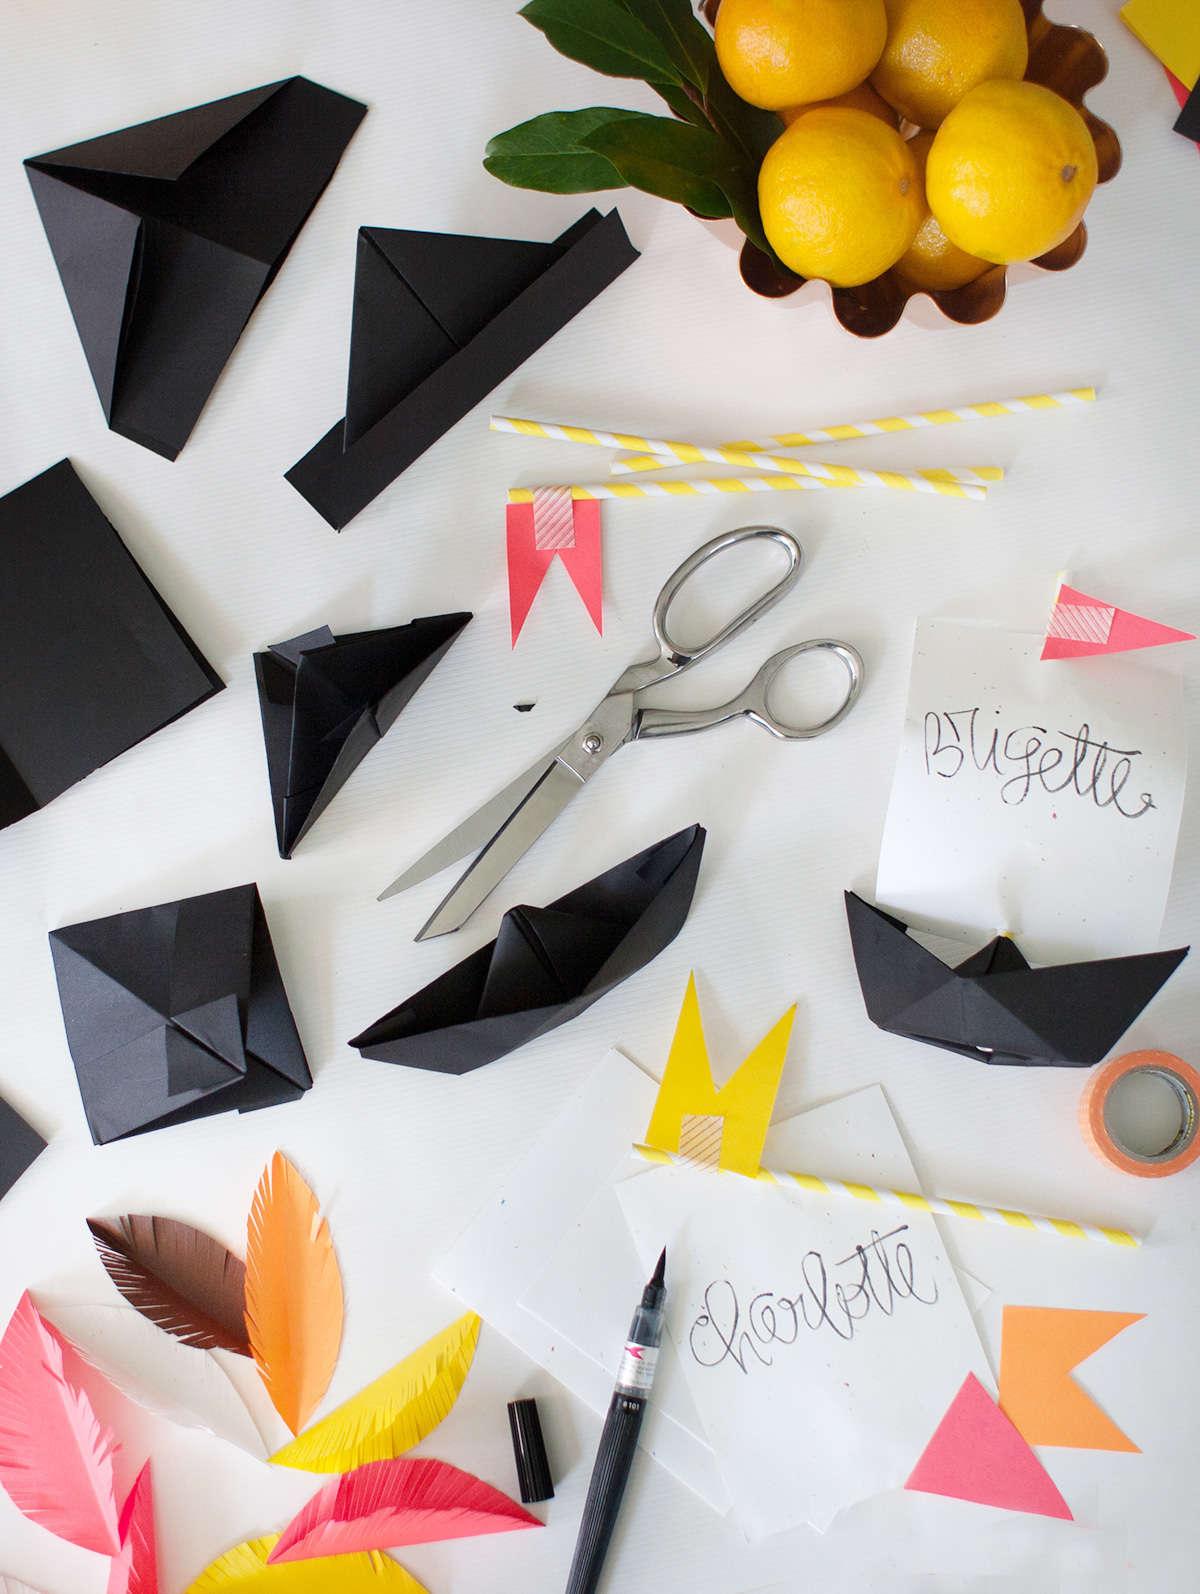 Diy thanksgiving paper decor - Diy Thanksgiving Placecards